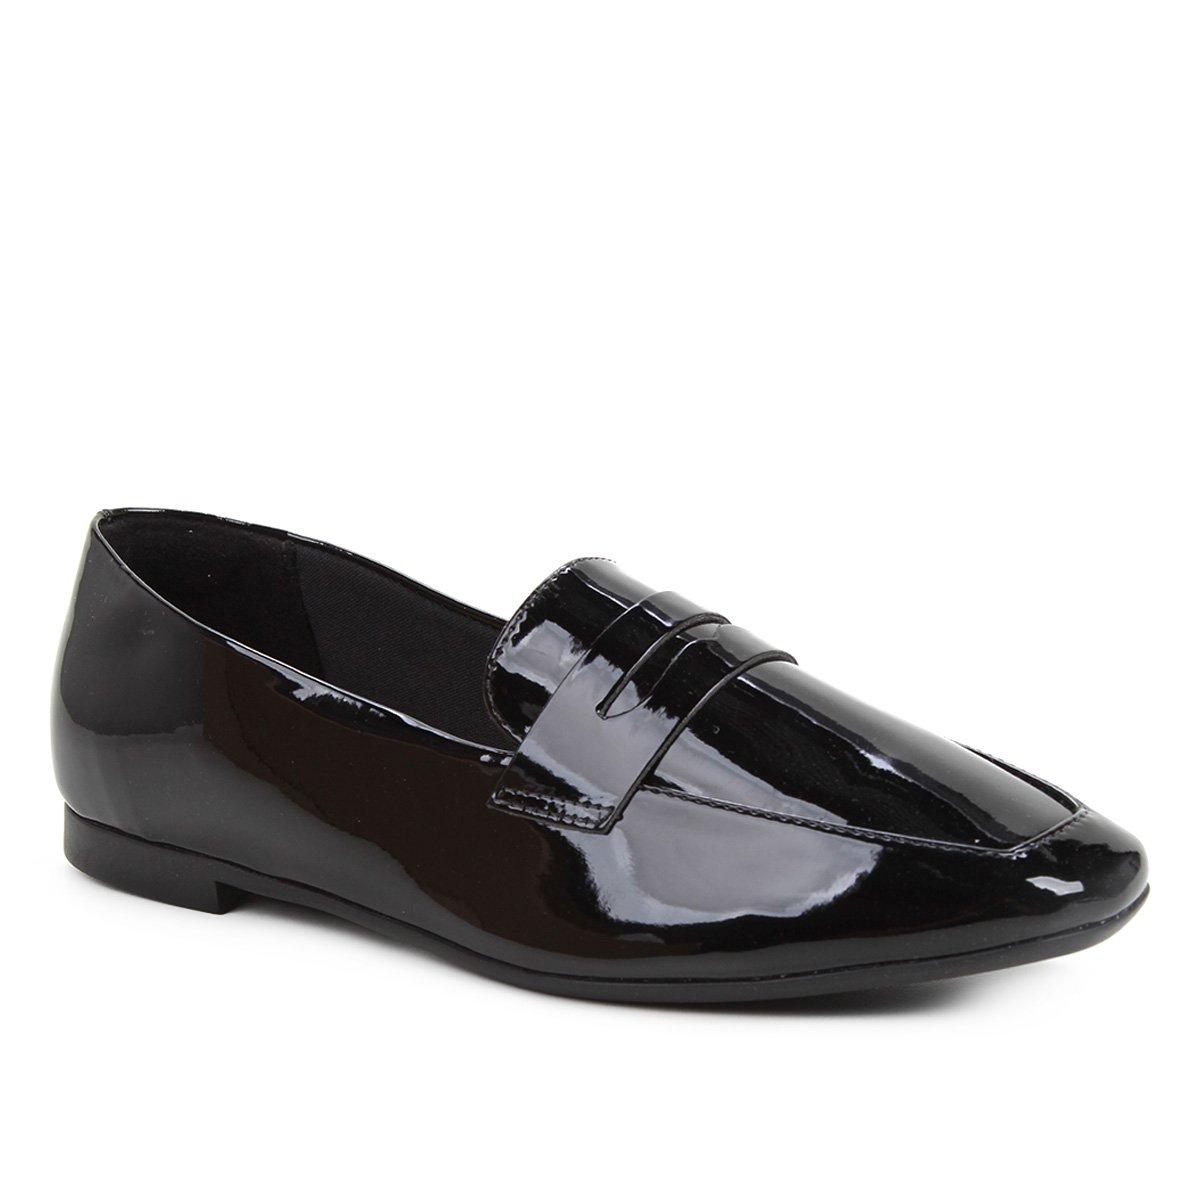 Mocassim Shoestock Loafer Verniz Feminino